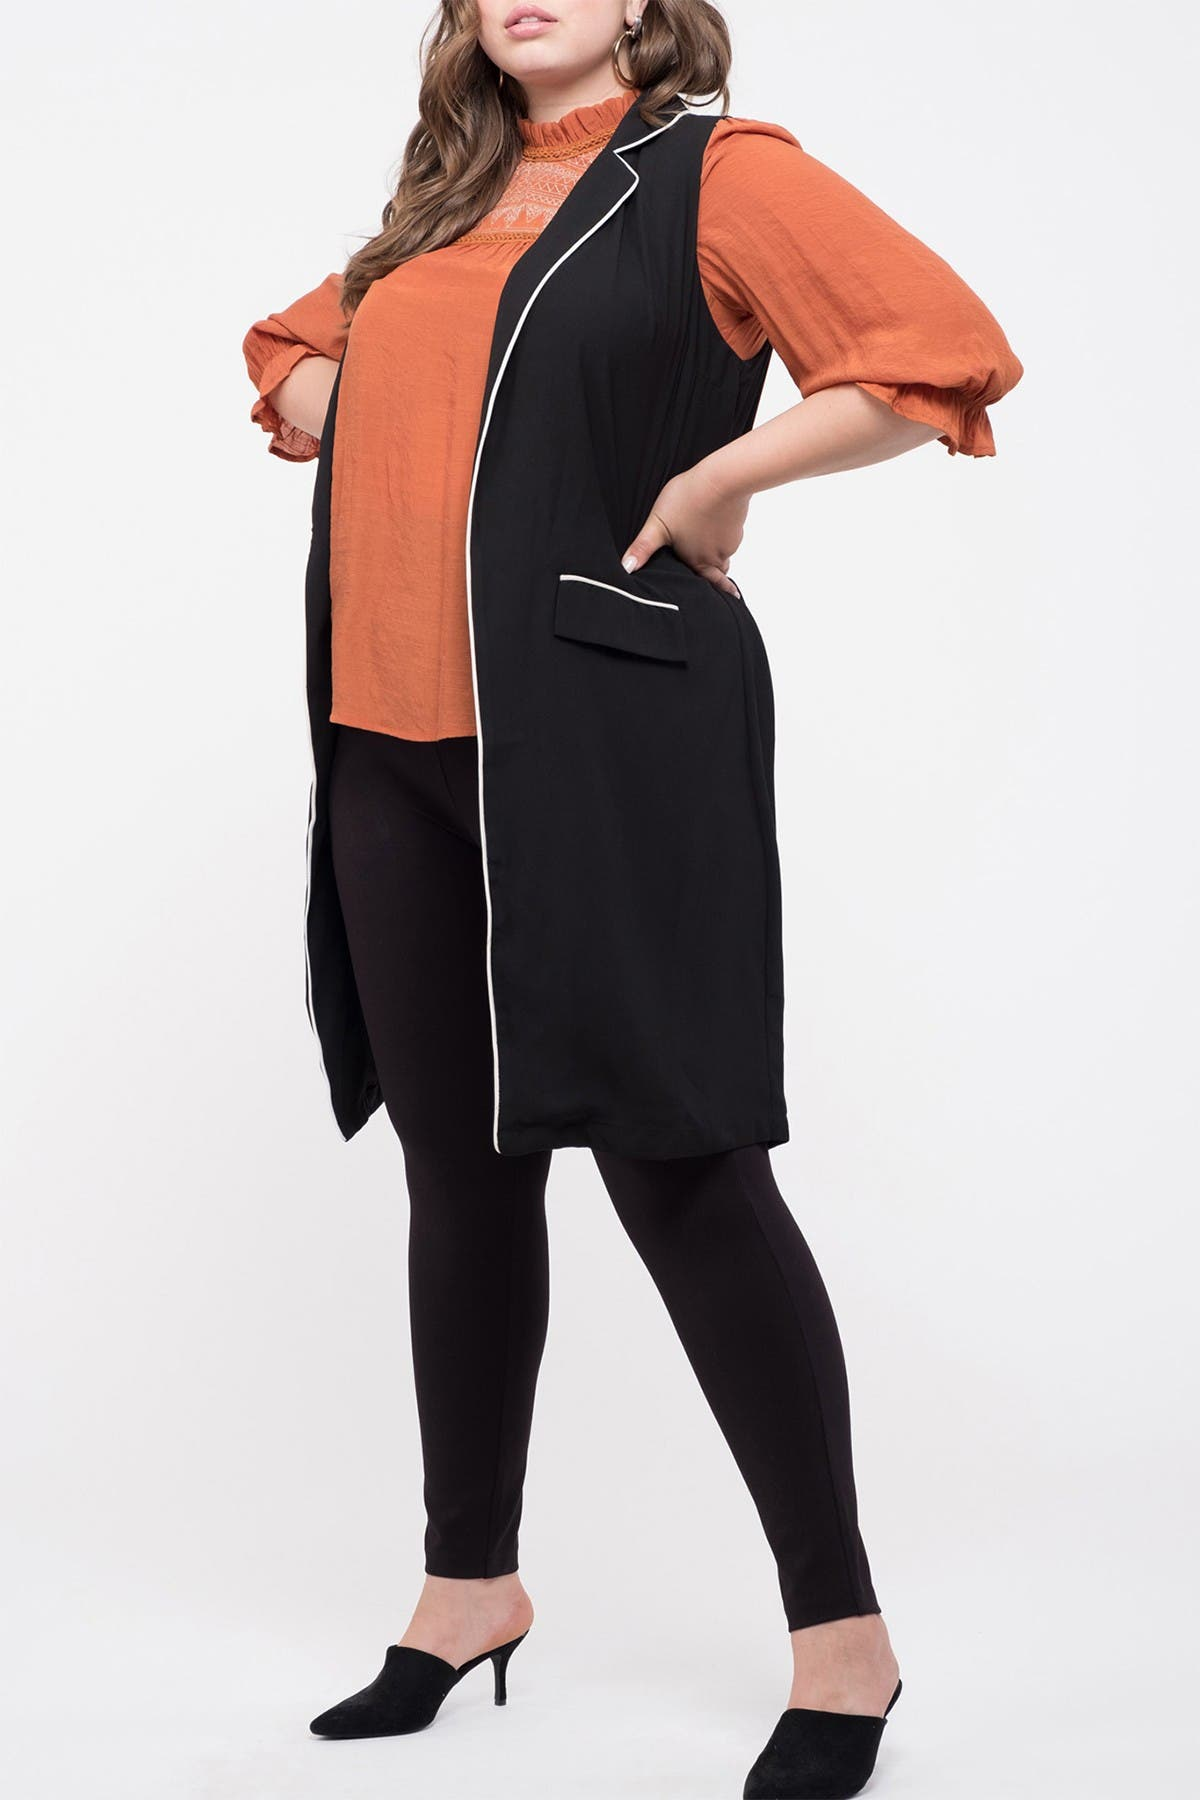 Blu Pepper Contrast Sleeveless Long Vest